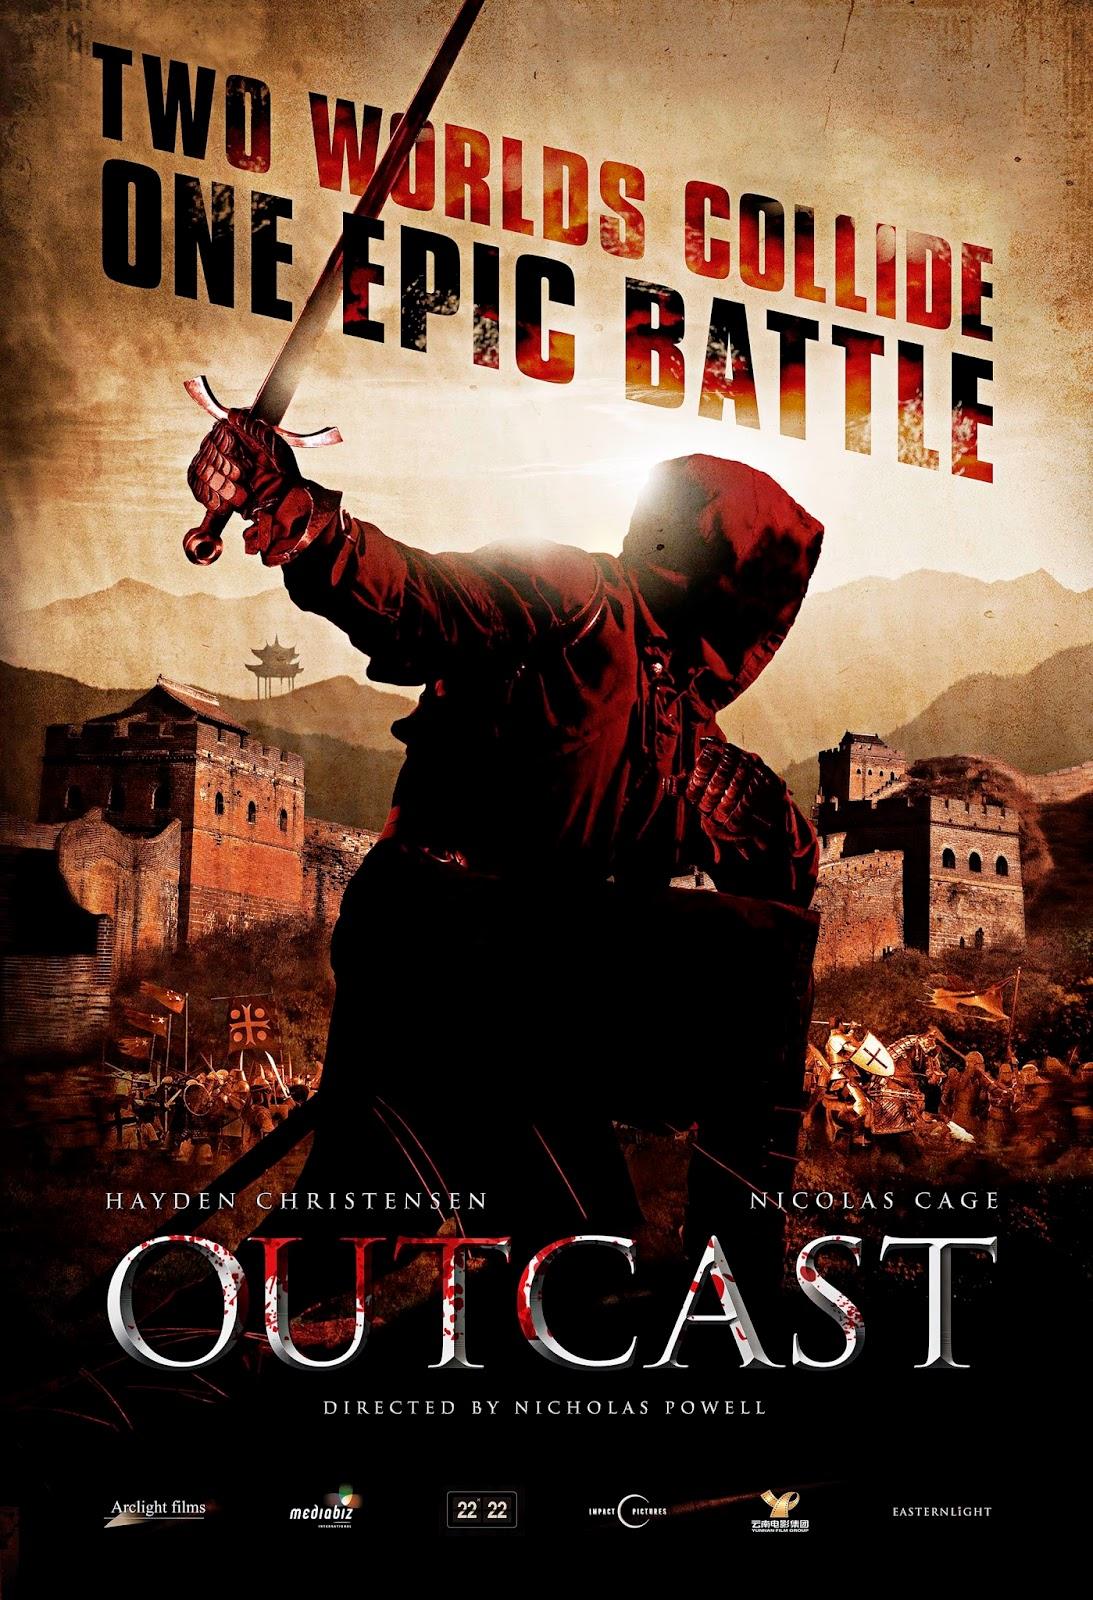 Outcast (2014), Nicolas Cage, Liu Yifei, Hayden Christensen ...